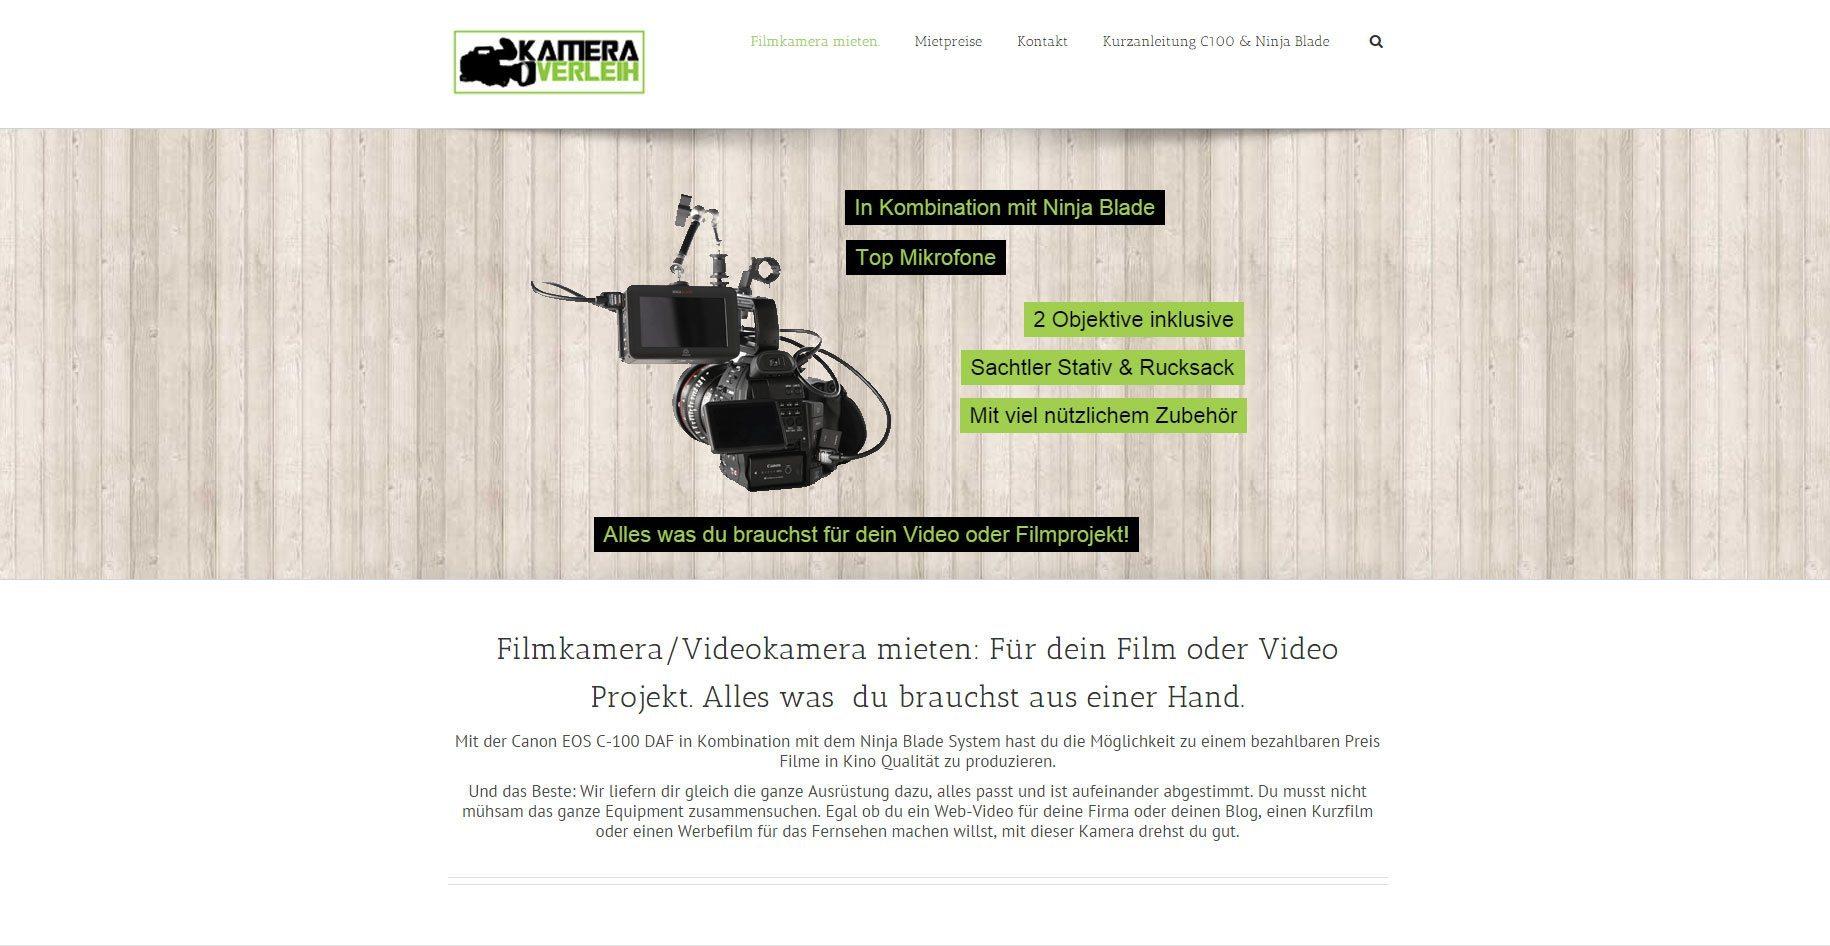 Kamera-Verleih: Filmequipment